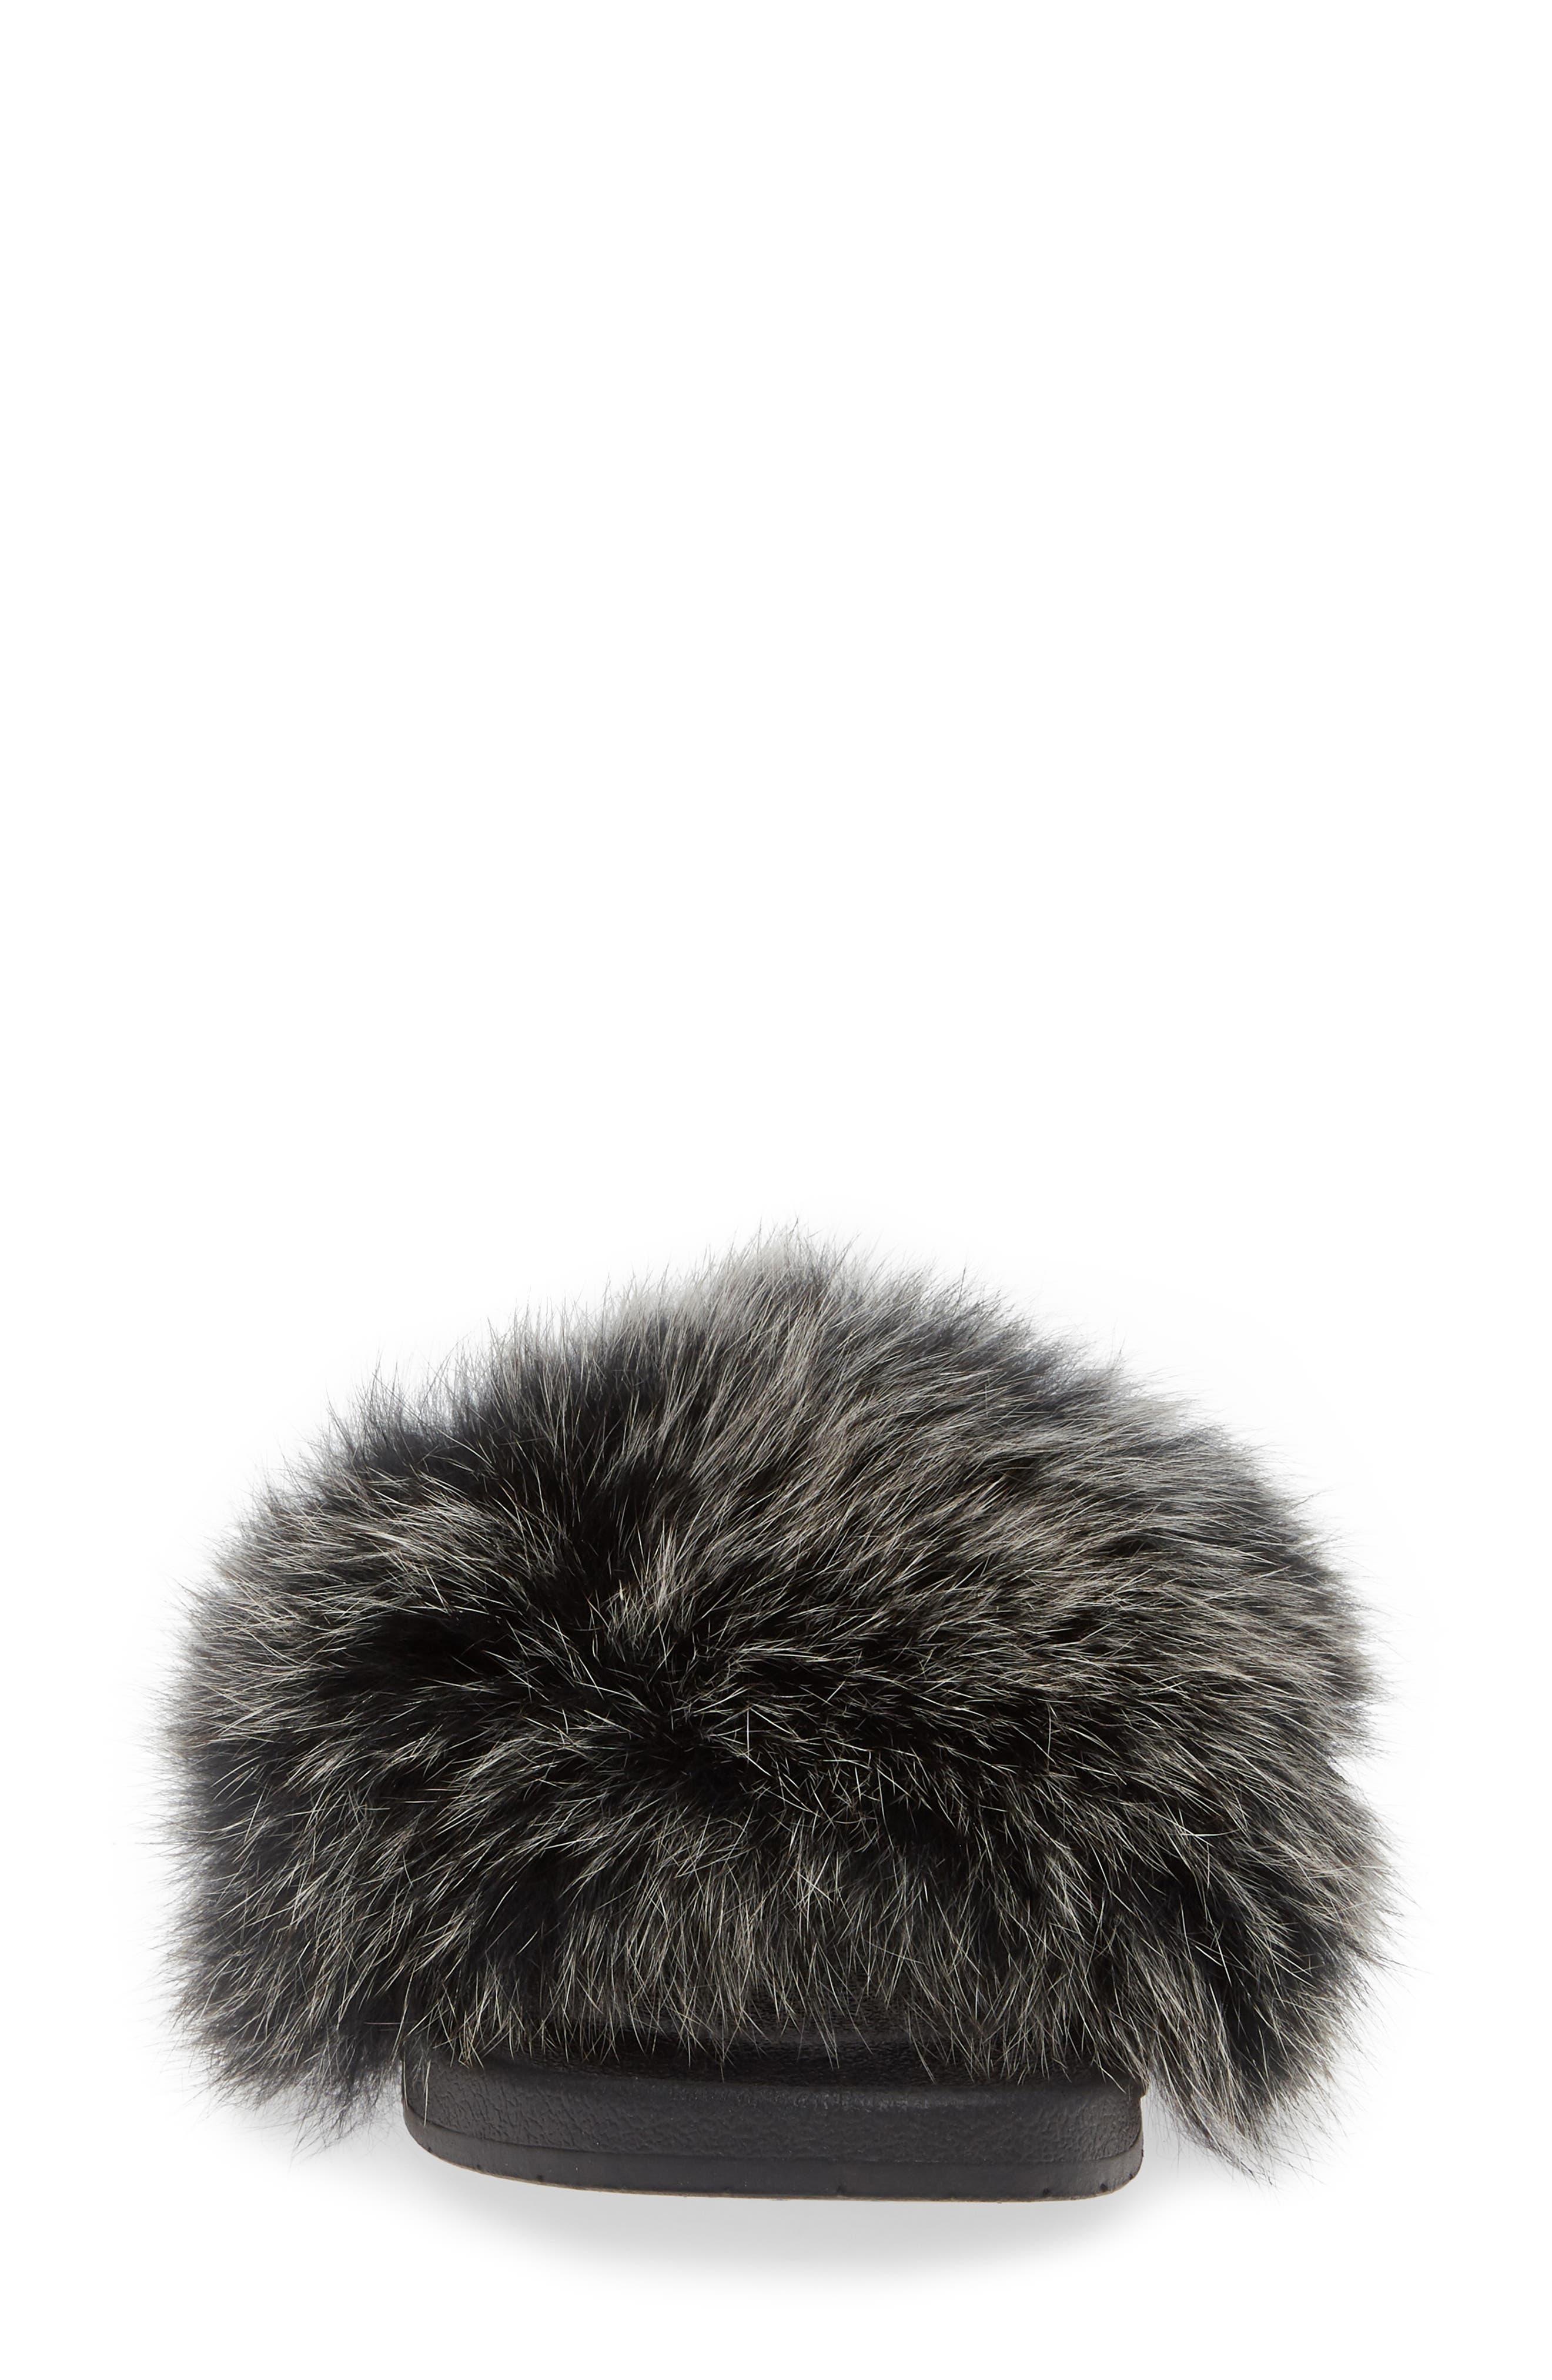 PATRICIA GREEN, Foxy Genuine Fox Fur Slipper, Alternate thumbnail 4, color, BLACK/ WHITE FUR